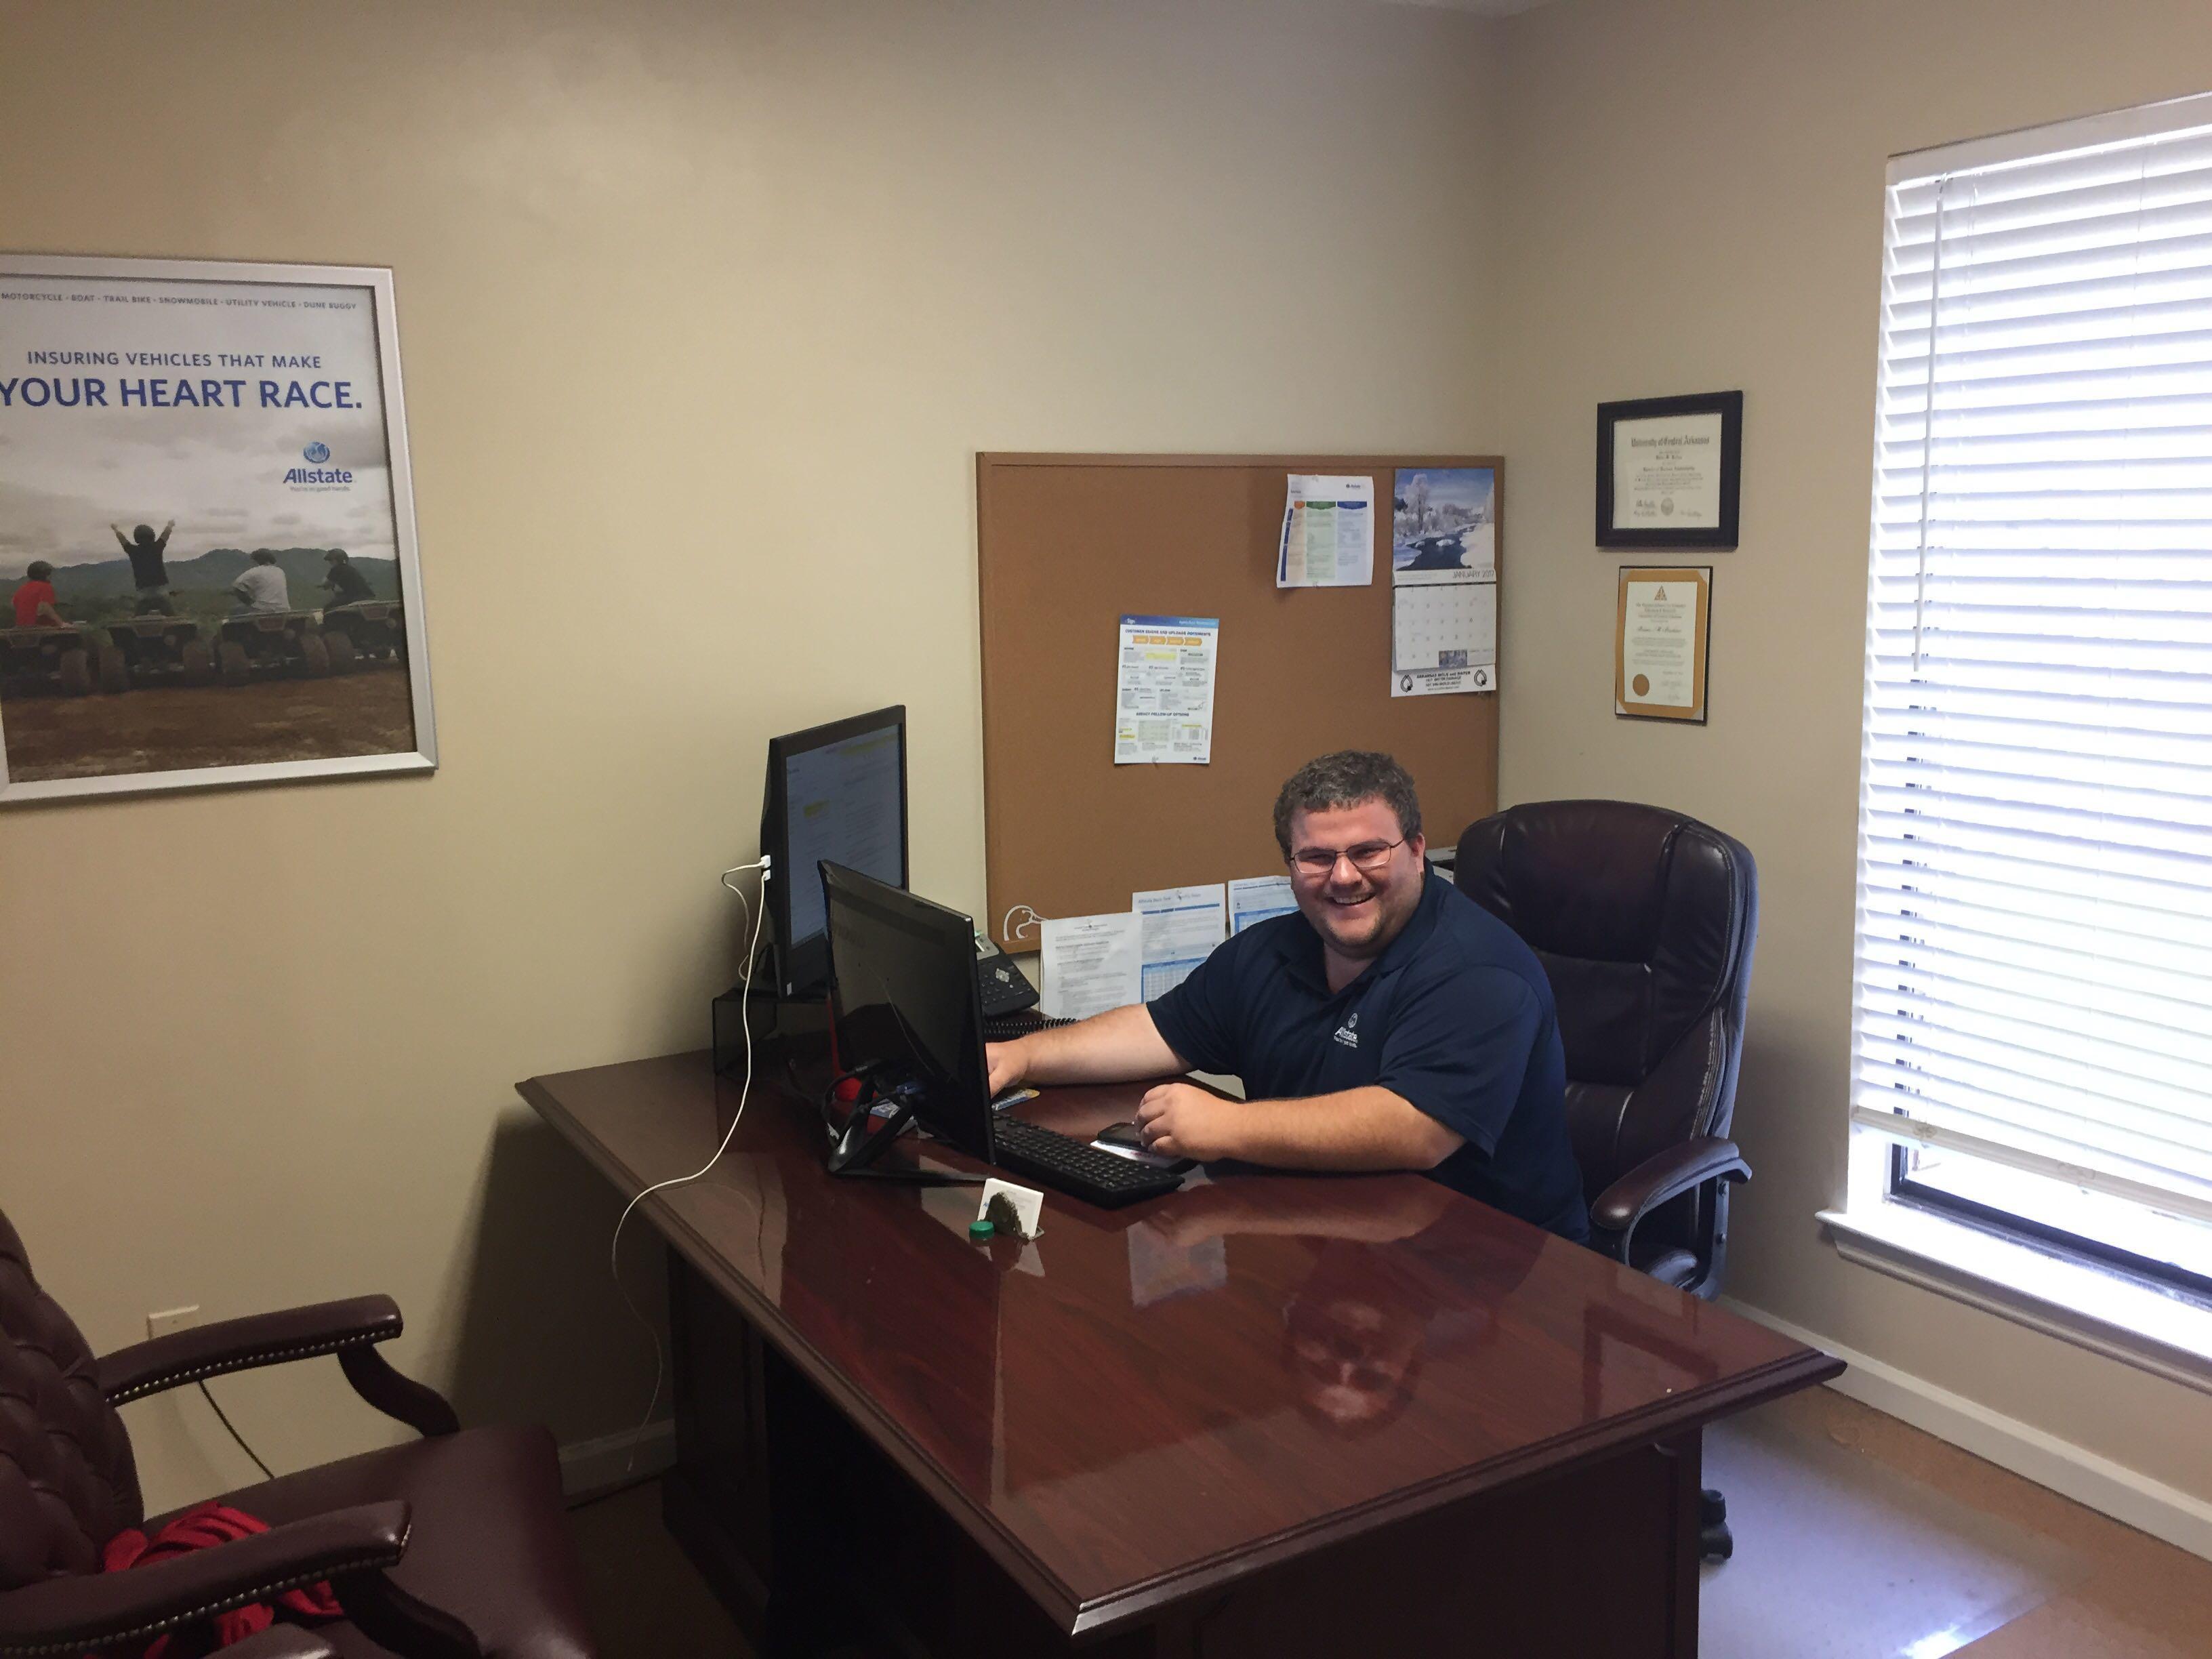 Waylon Biggs: Allstate Insurance image 3